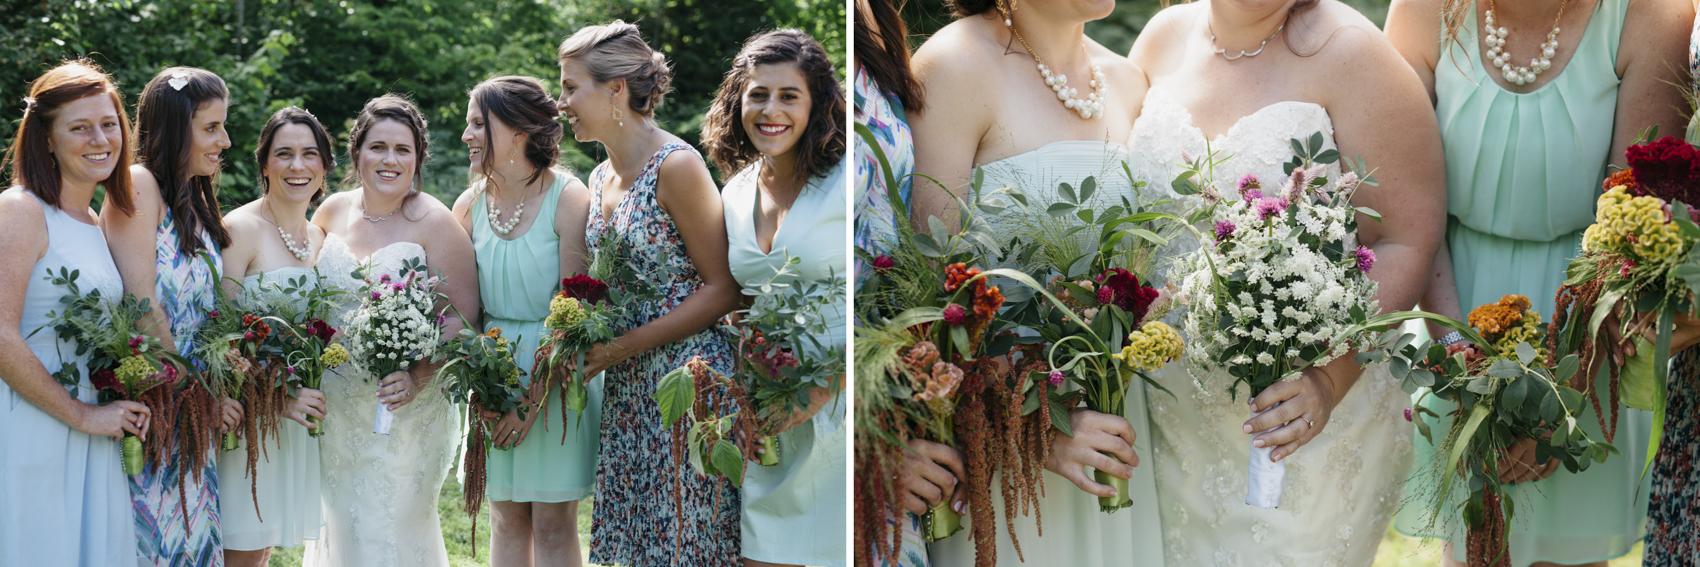 LFA_JuliaGlenn_Sugarloaf_Maine_Wedding005.jpg